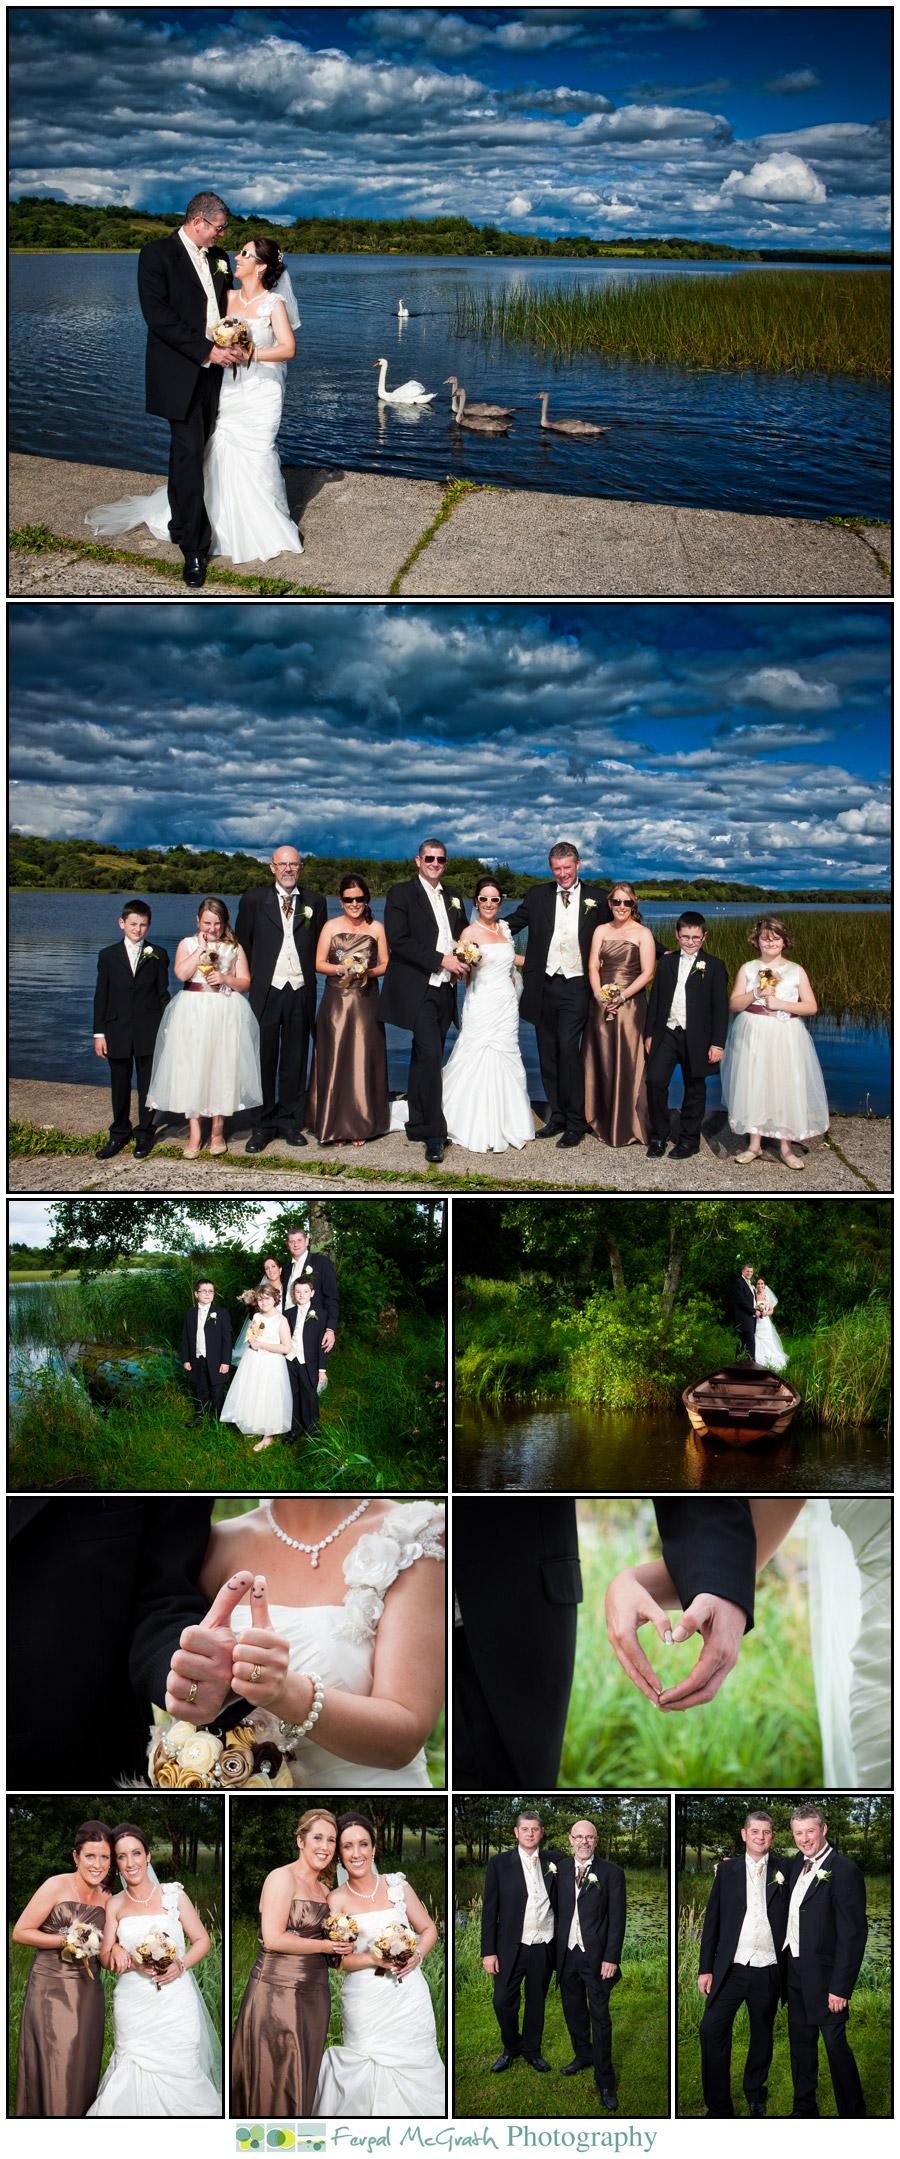 breda paul wedding photos great northern hotel bundoran 8